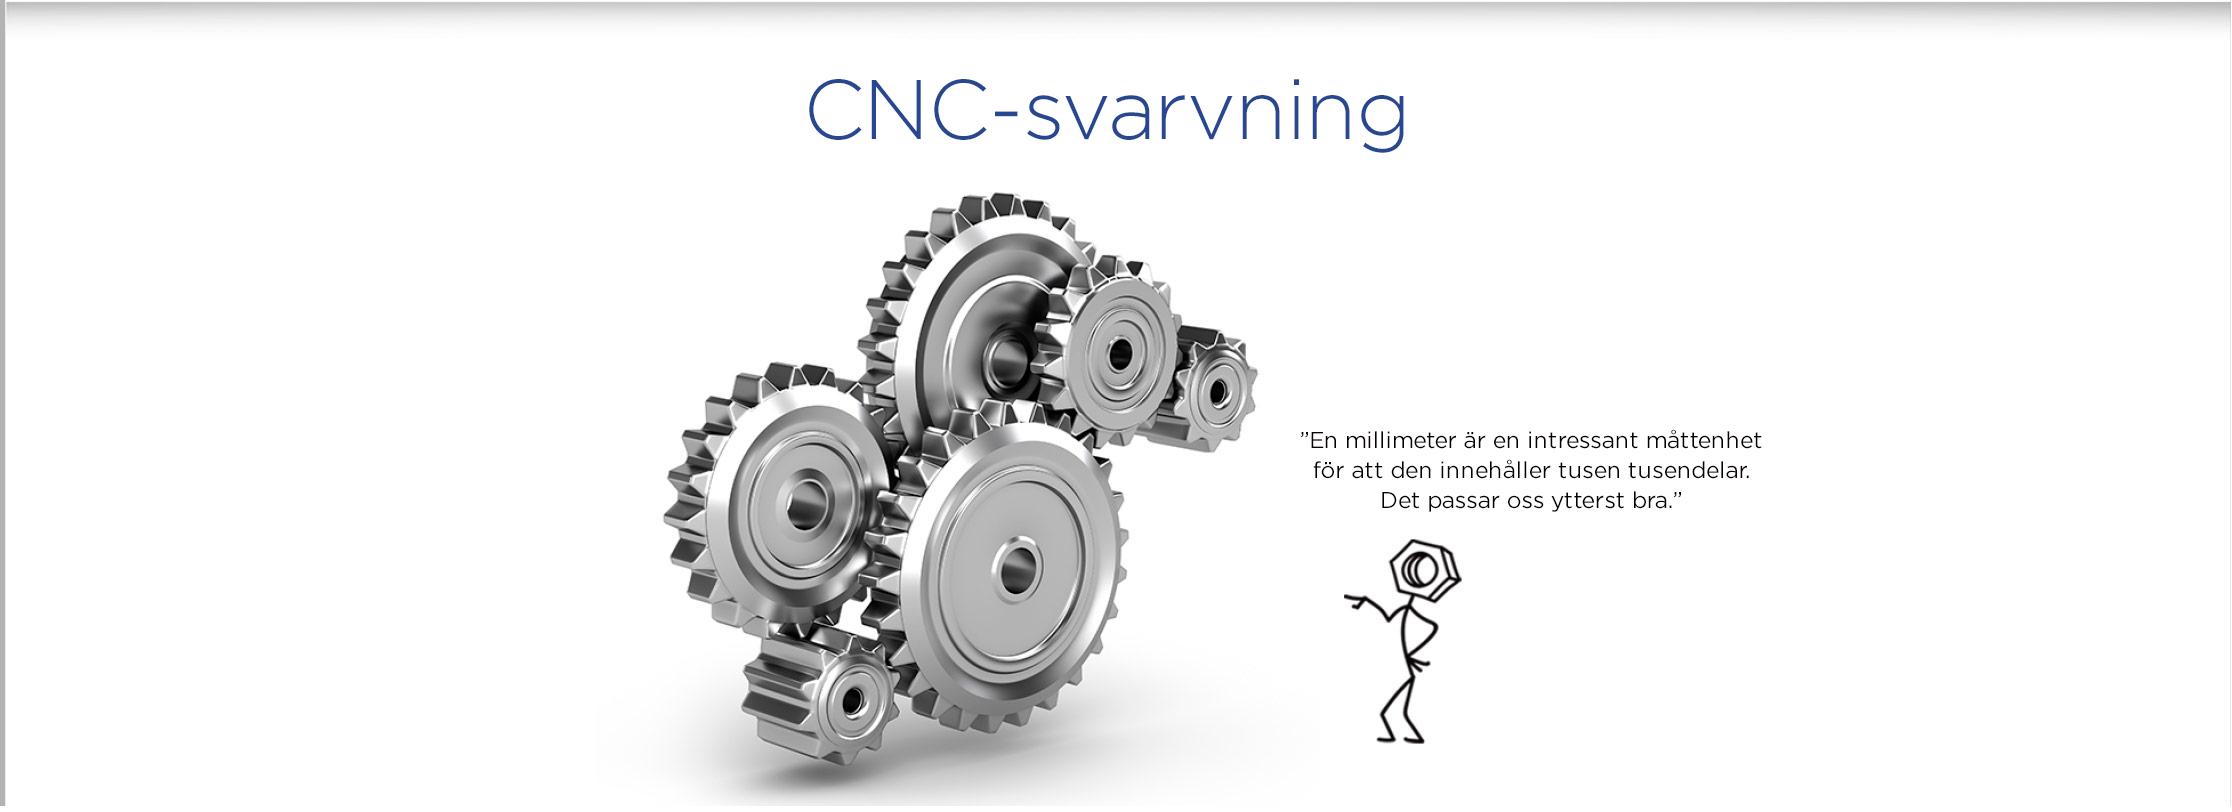 cnc-svarning